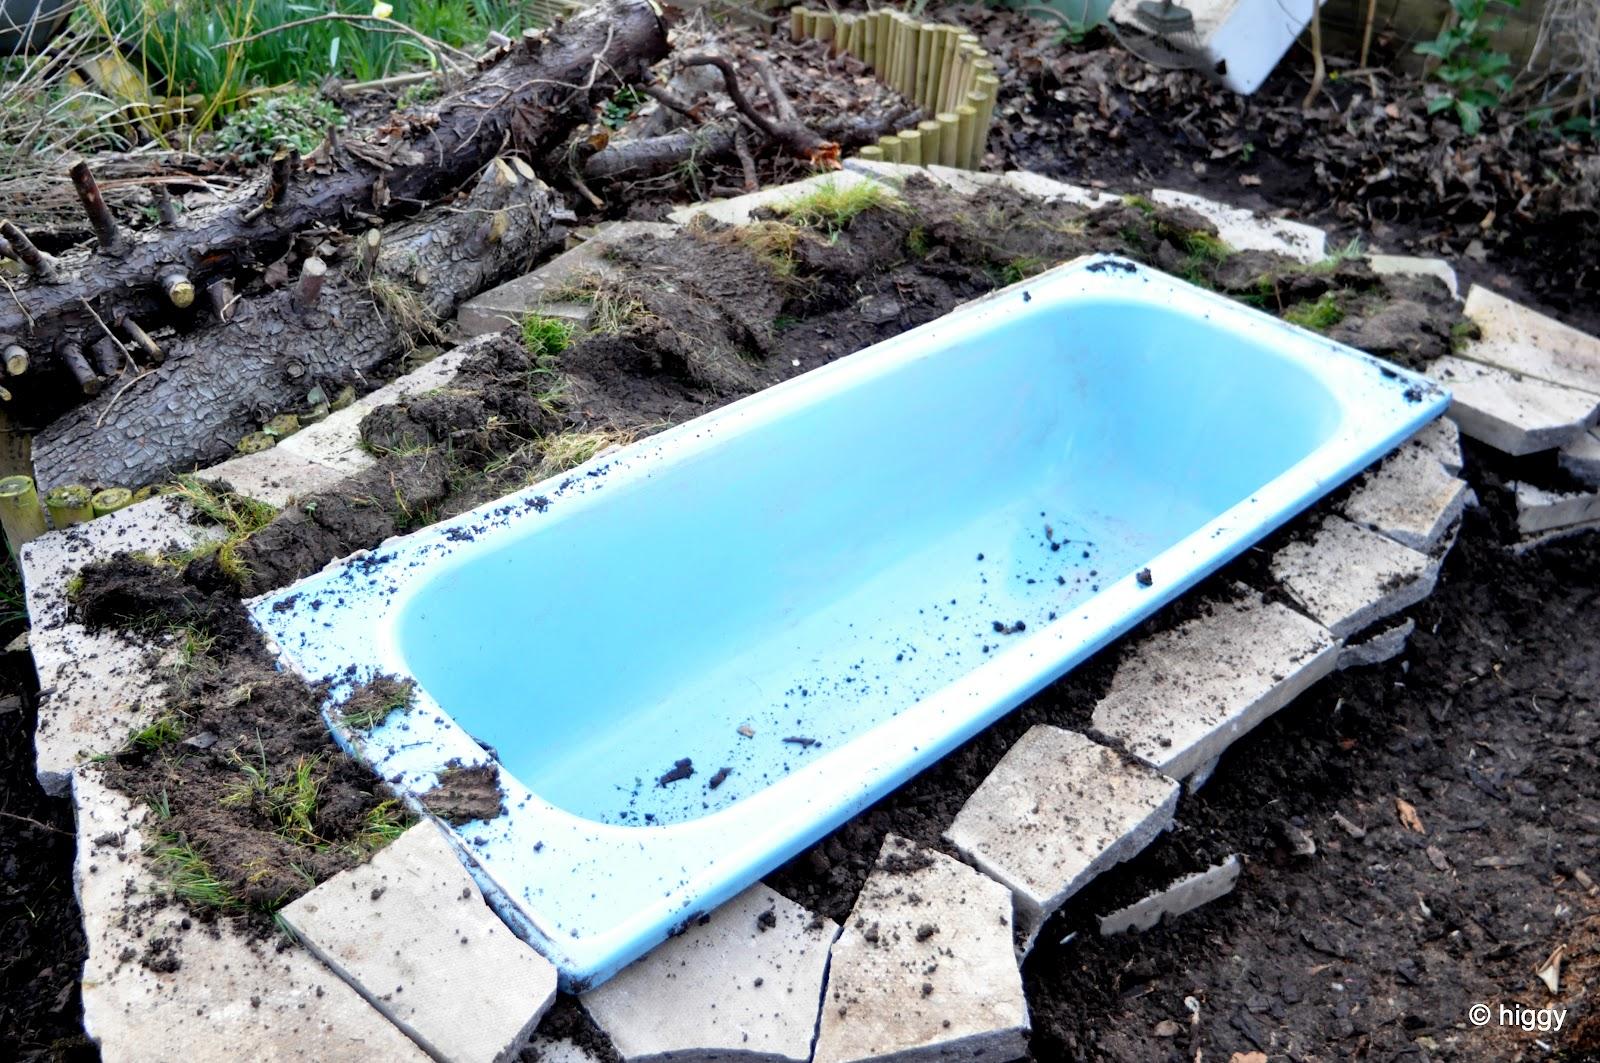 Higgy S Garden Project As Seen On Bbc Springwatch